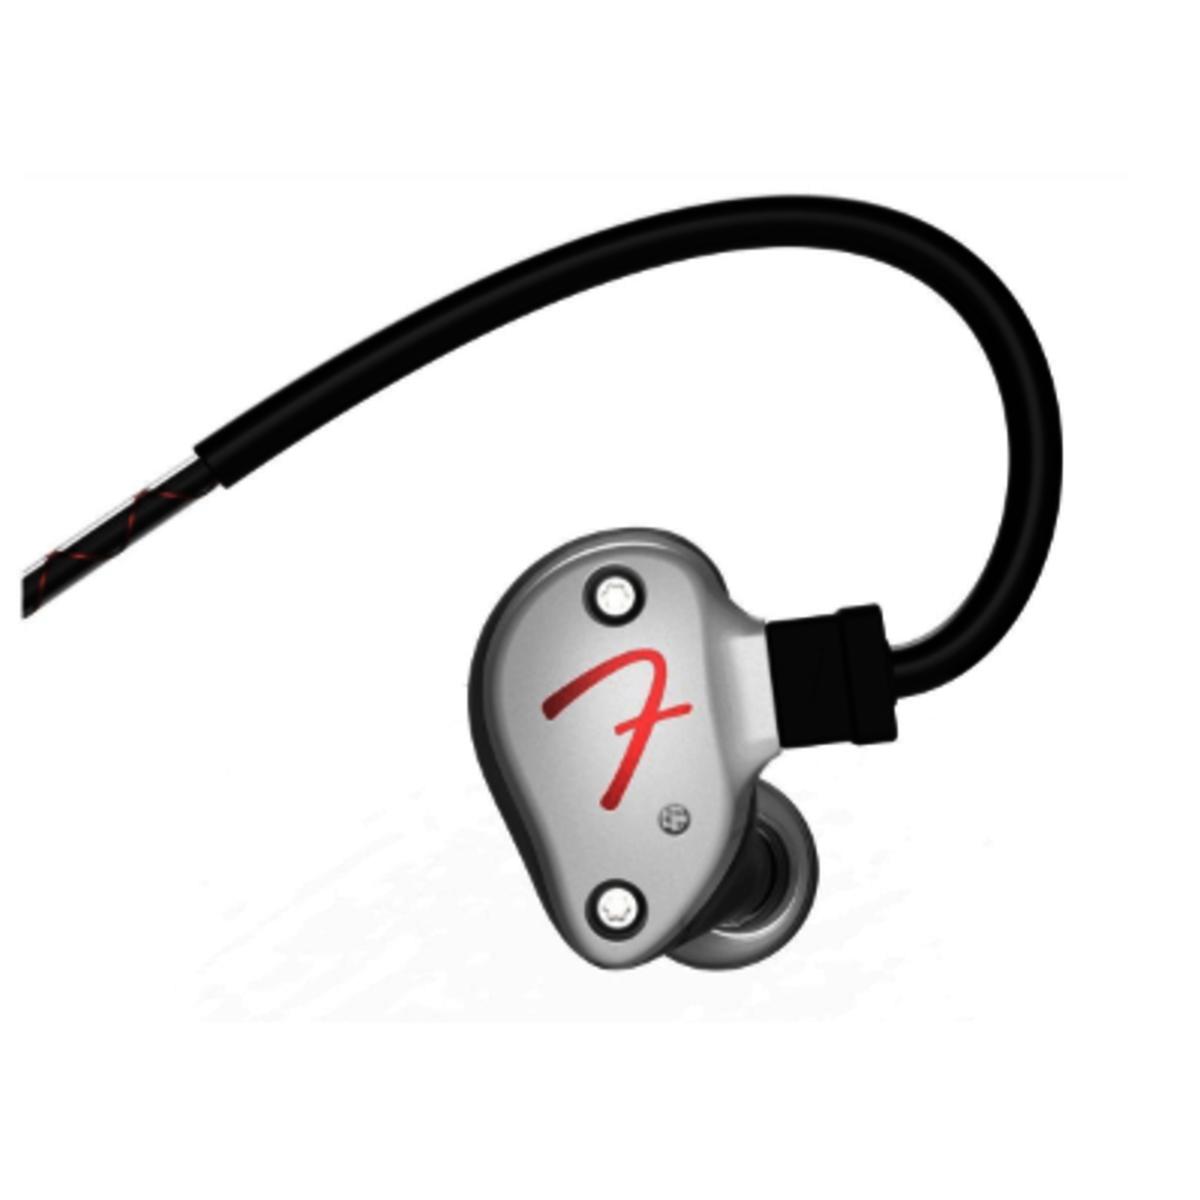 NINE 0 9.25mm 大動圈監聽耳機[白色]